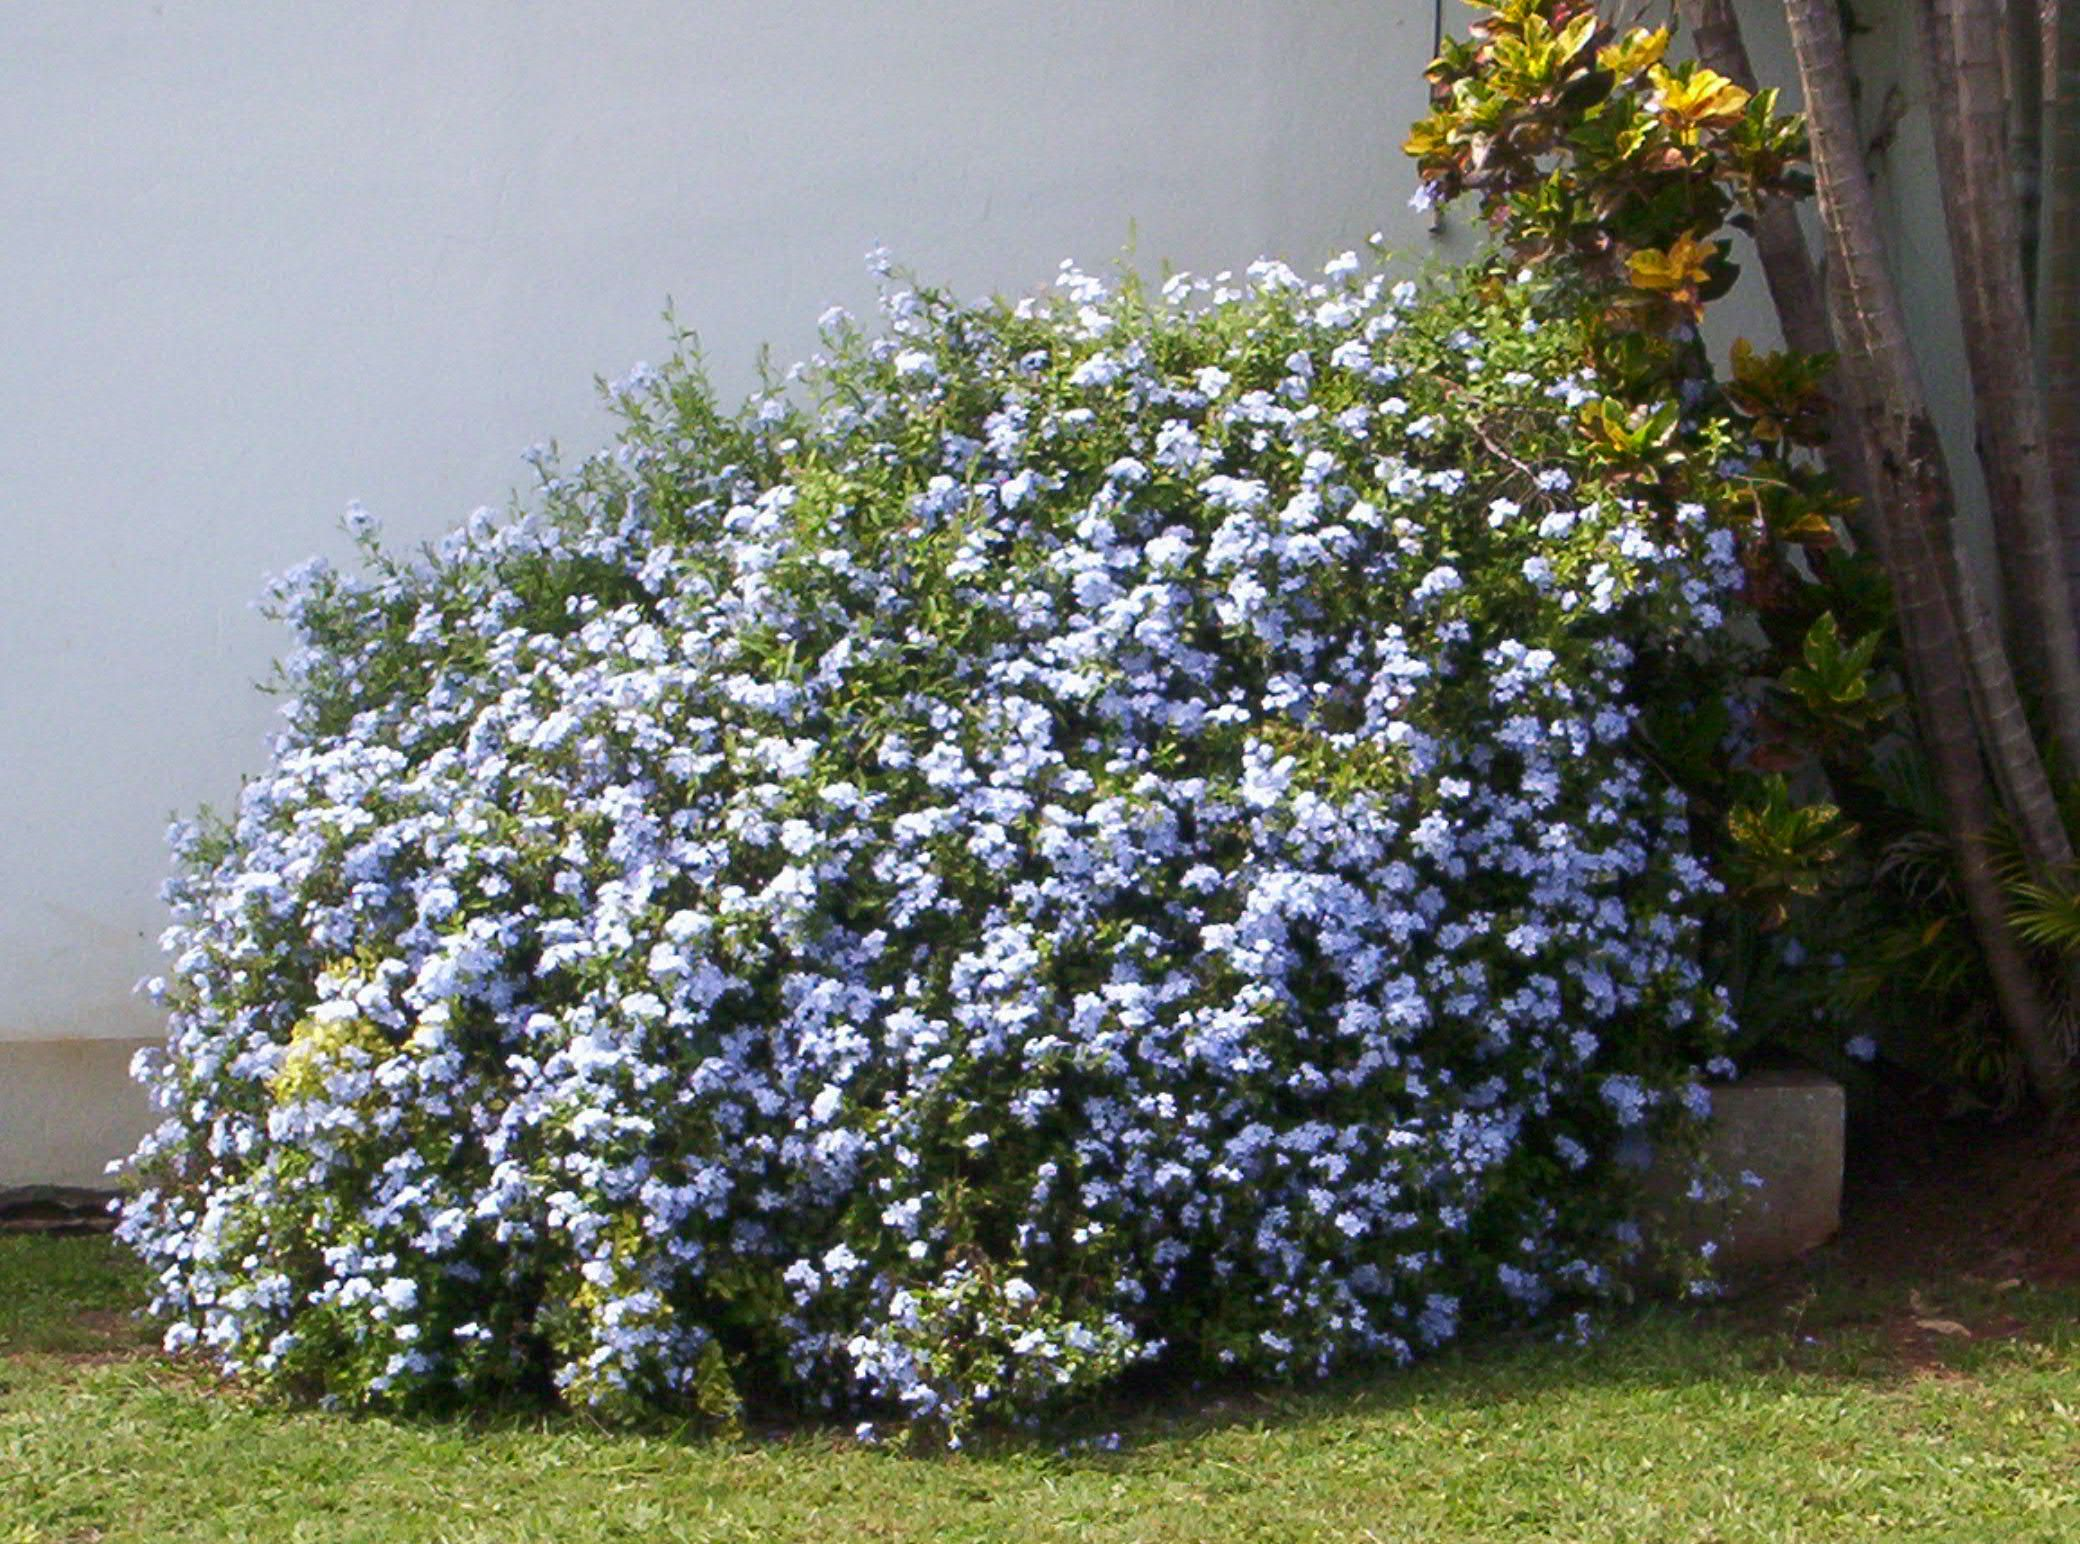 Plumbago capensis arbustos ornamentales fotos propias for Arbustos ornamentales